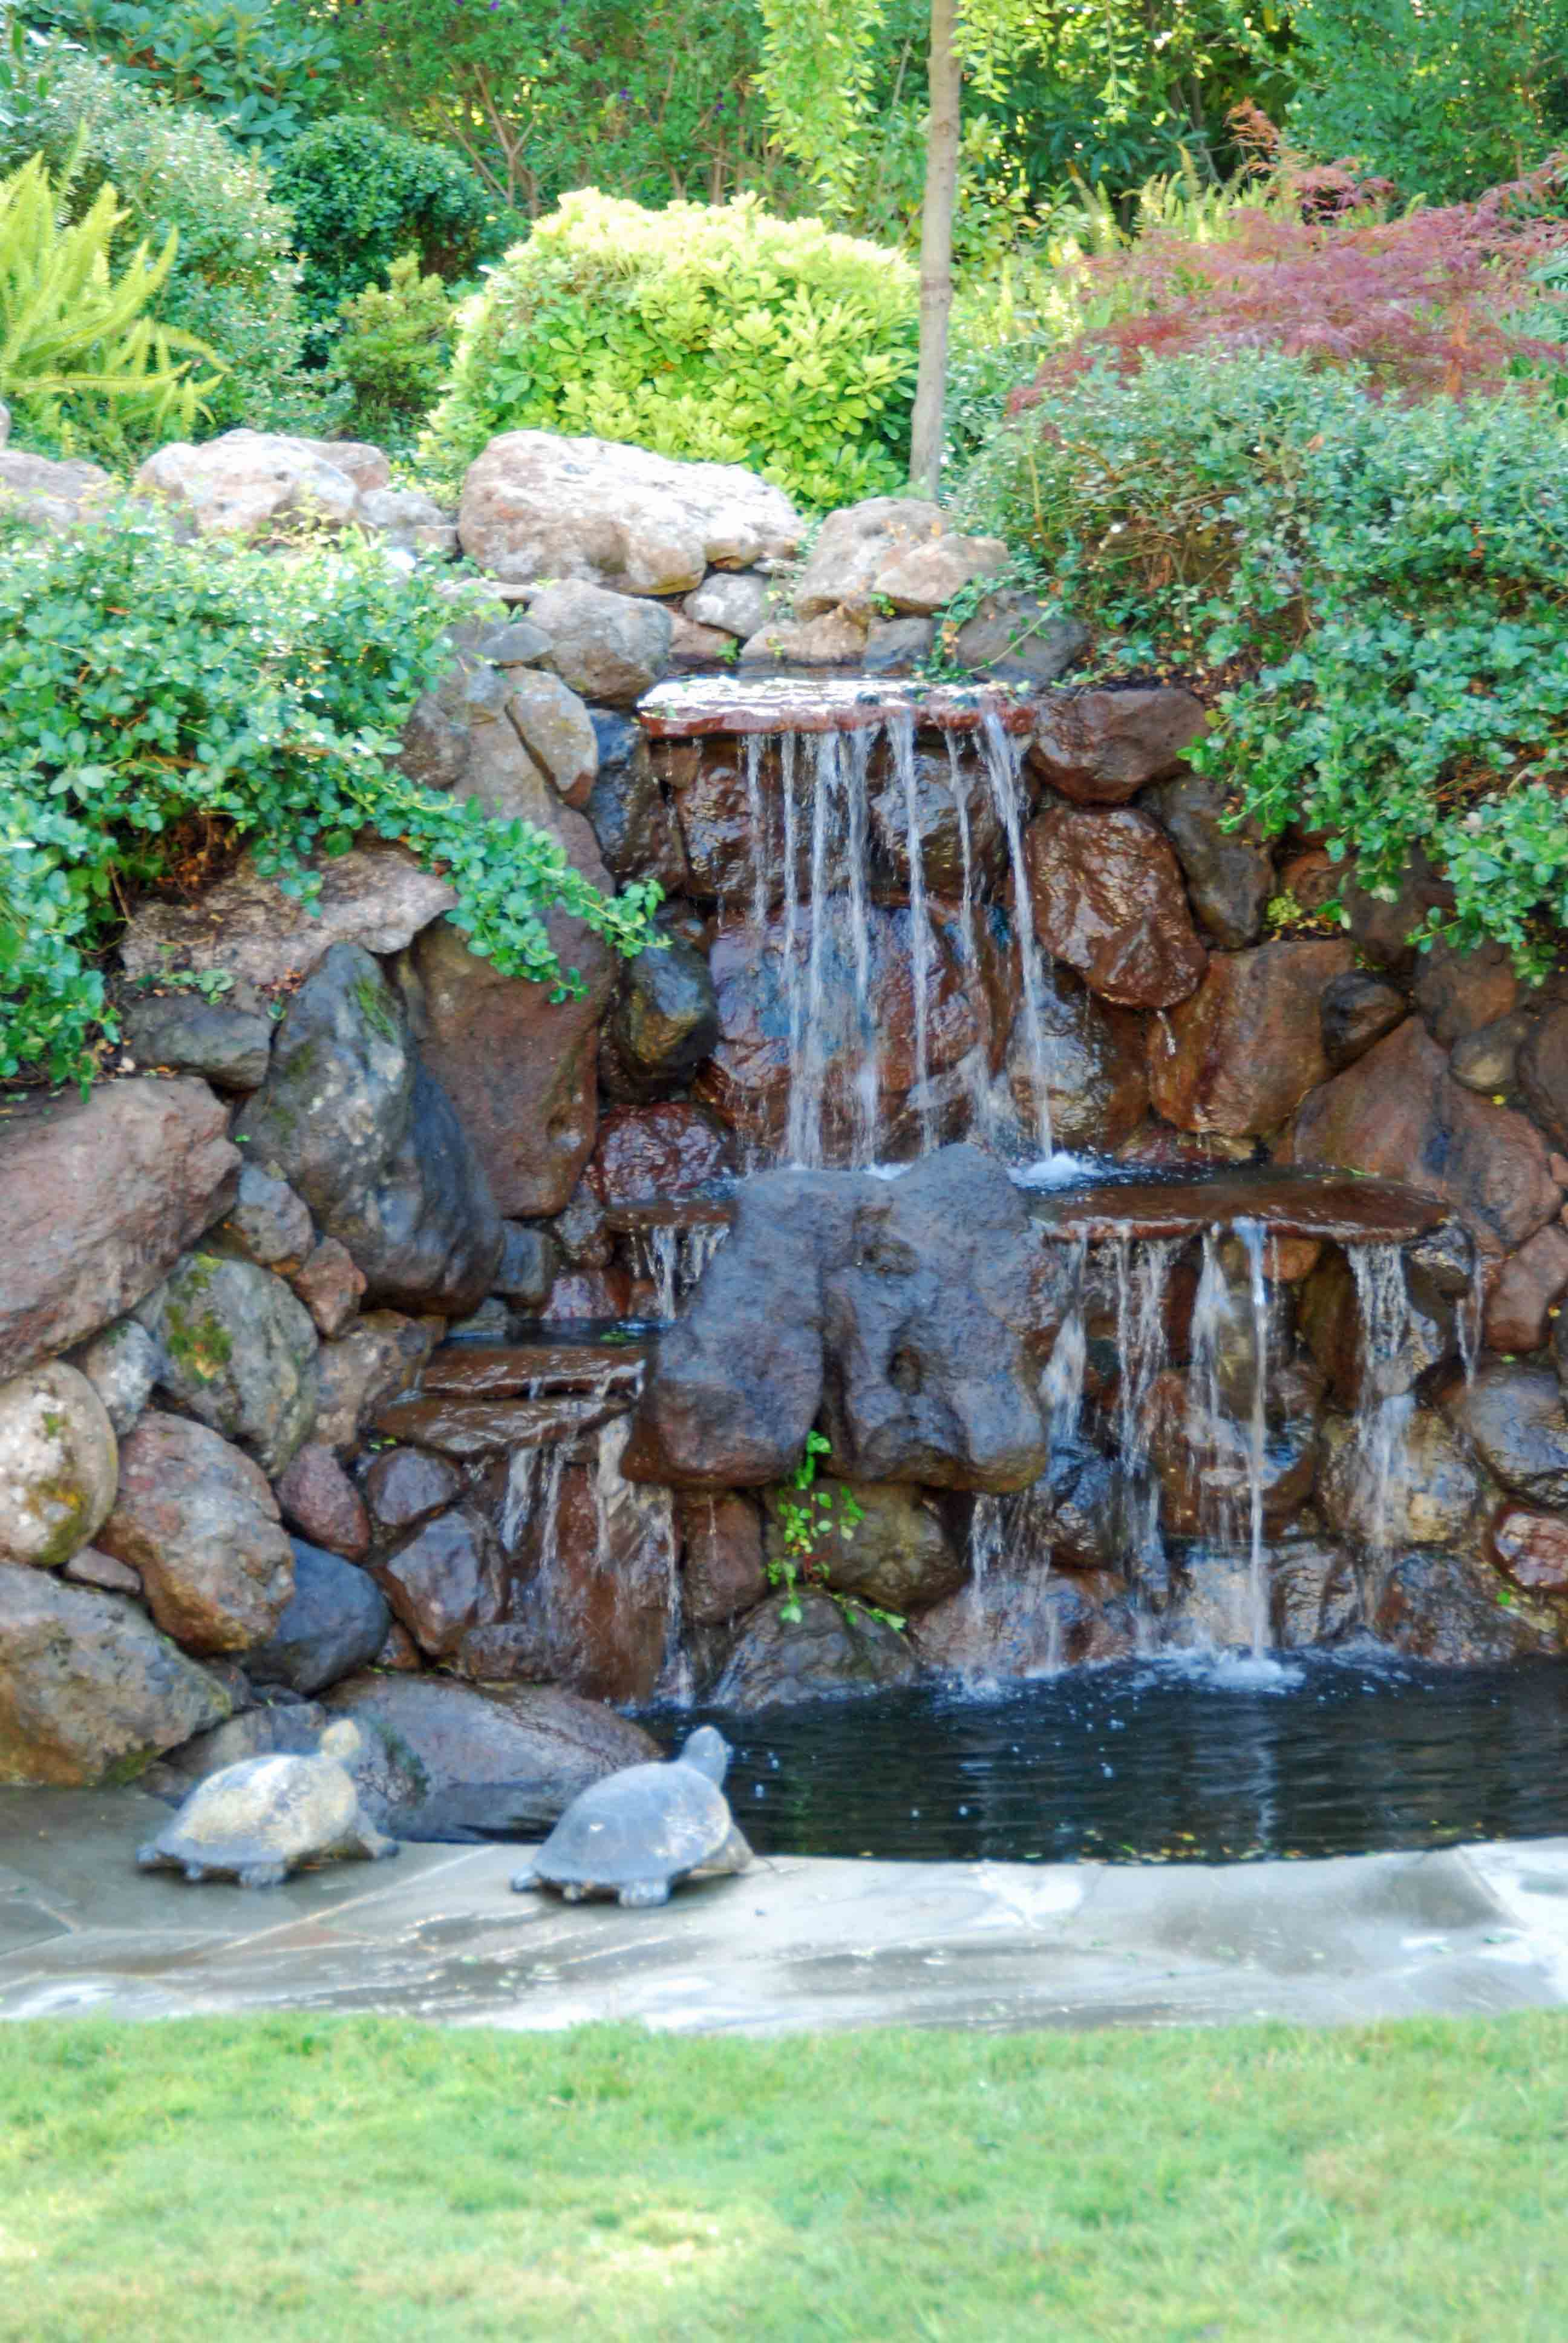 Recirculating waterfall